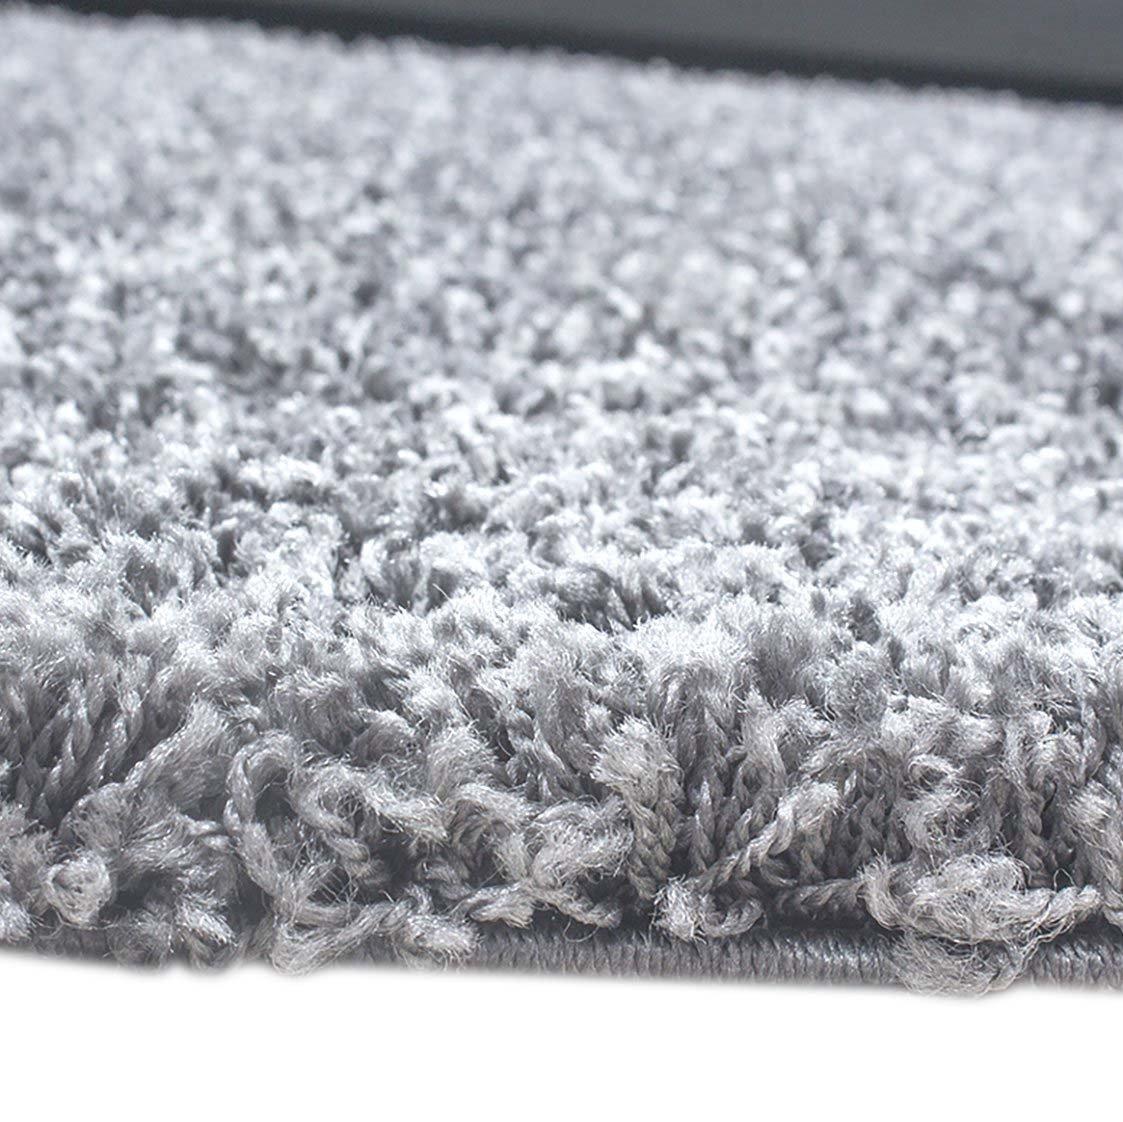 Carpetia Shaggy Teppich Hochflor Langflor Bettvorleger Wohnzimmer Teppich Teppich Teppich Läufer Uni hellgrau grau Größe 160x230 cm 0fcabf